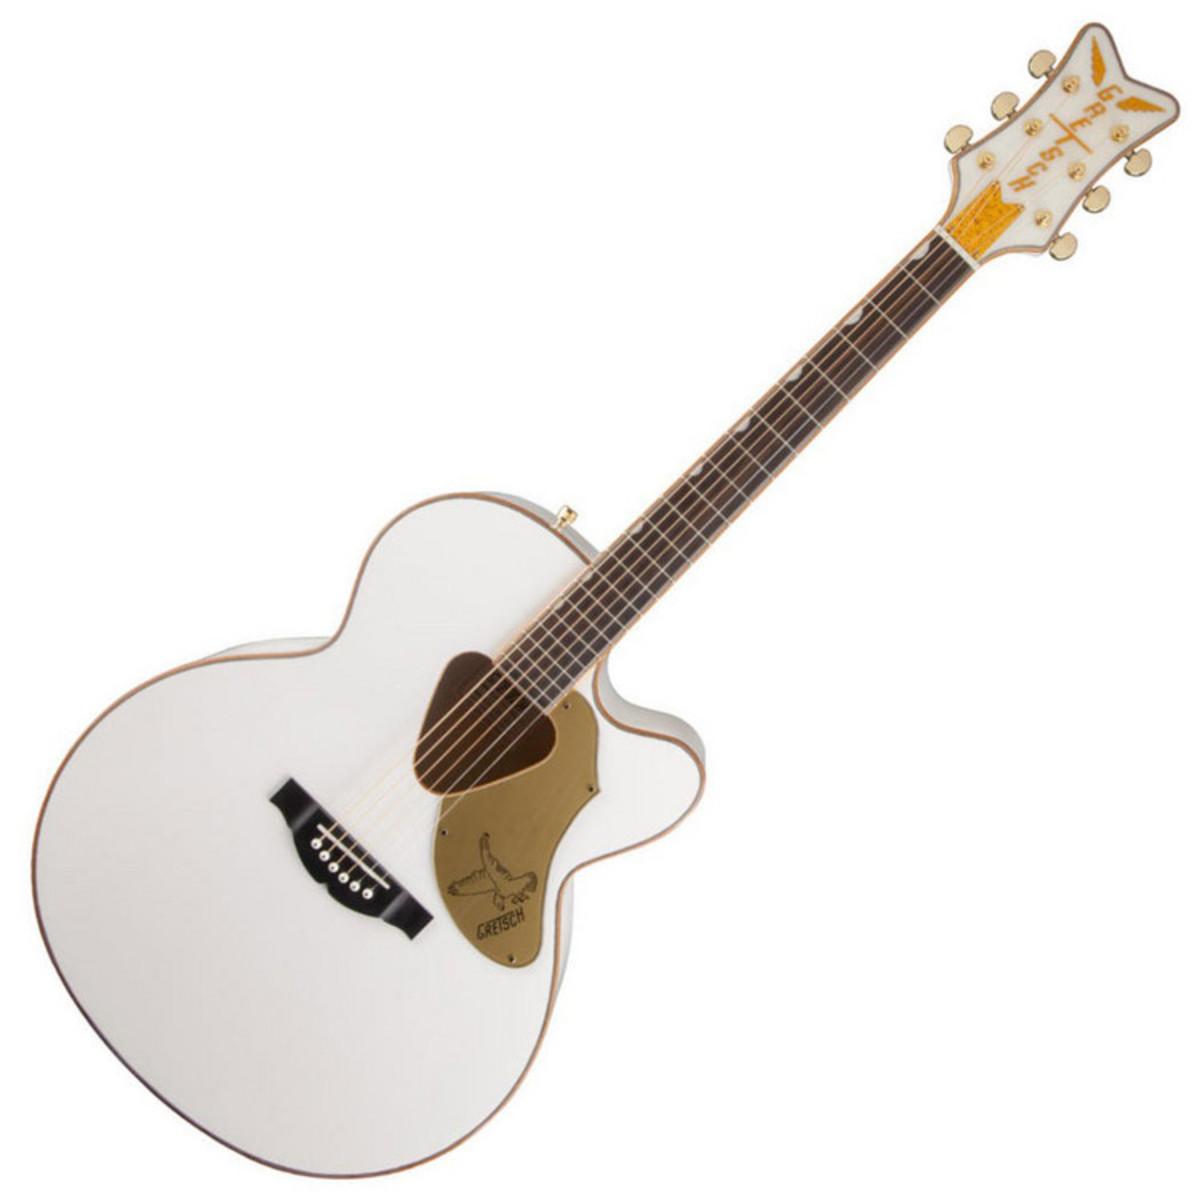 Gretsch Acoustic Guitars >> Gretsch G5022cwfe Rancher Falcon Jumbo Electro Acoustic Guitar B Stock